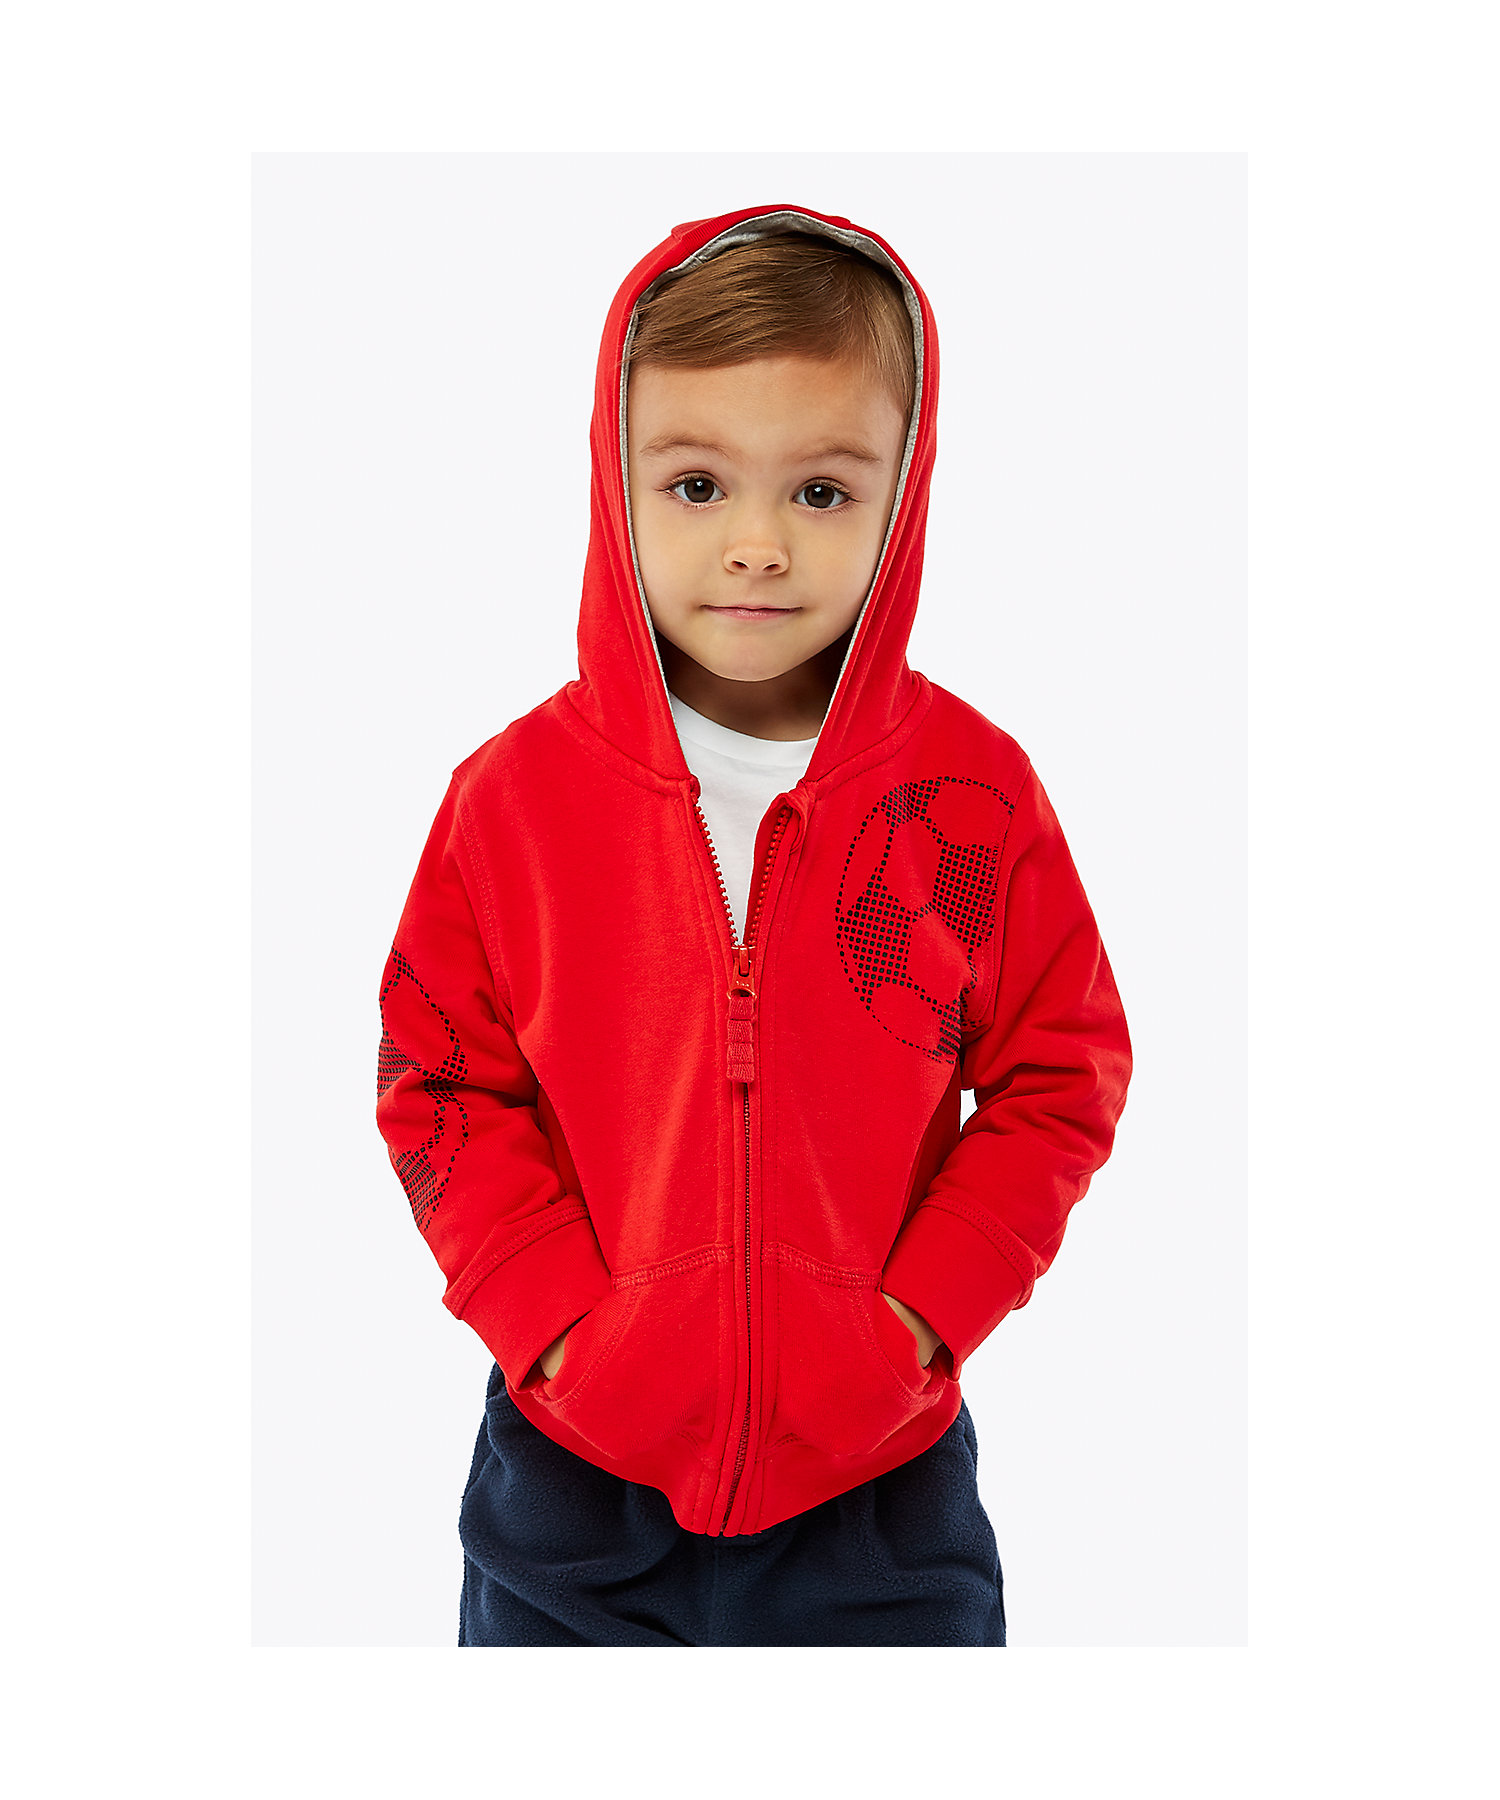 Mothercare   Boys Full Sleeves Hooded Sweatshirt Football Print - Red